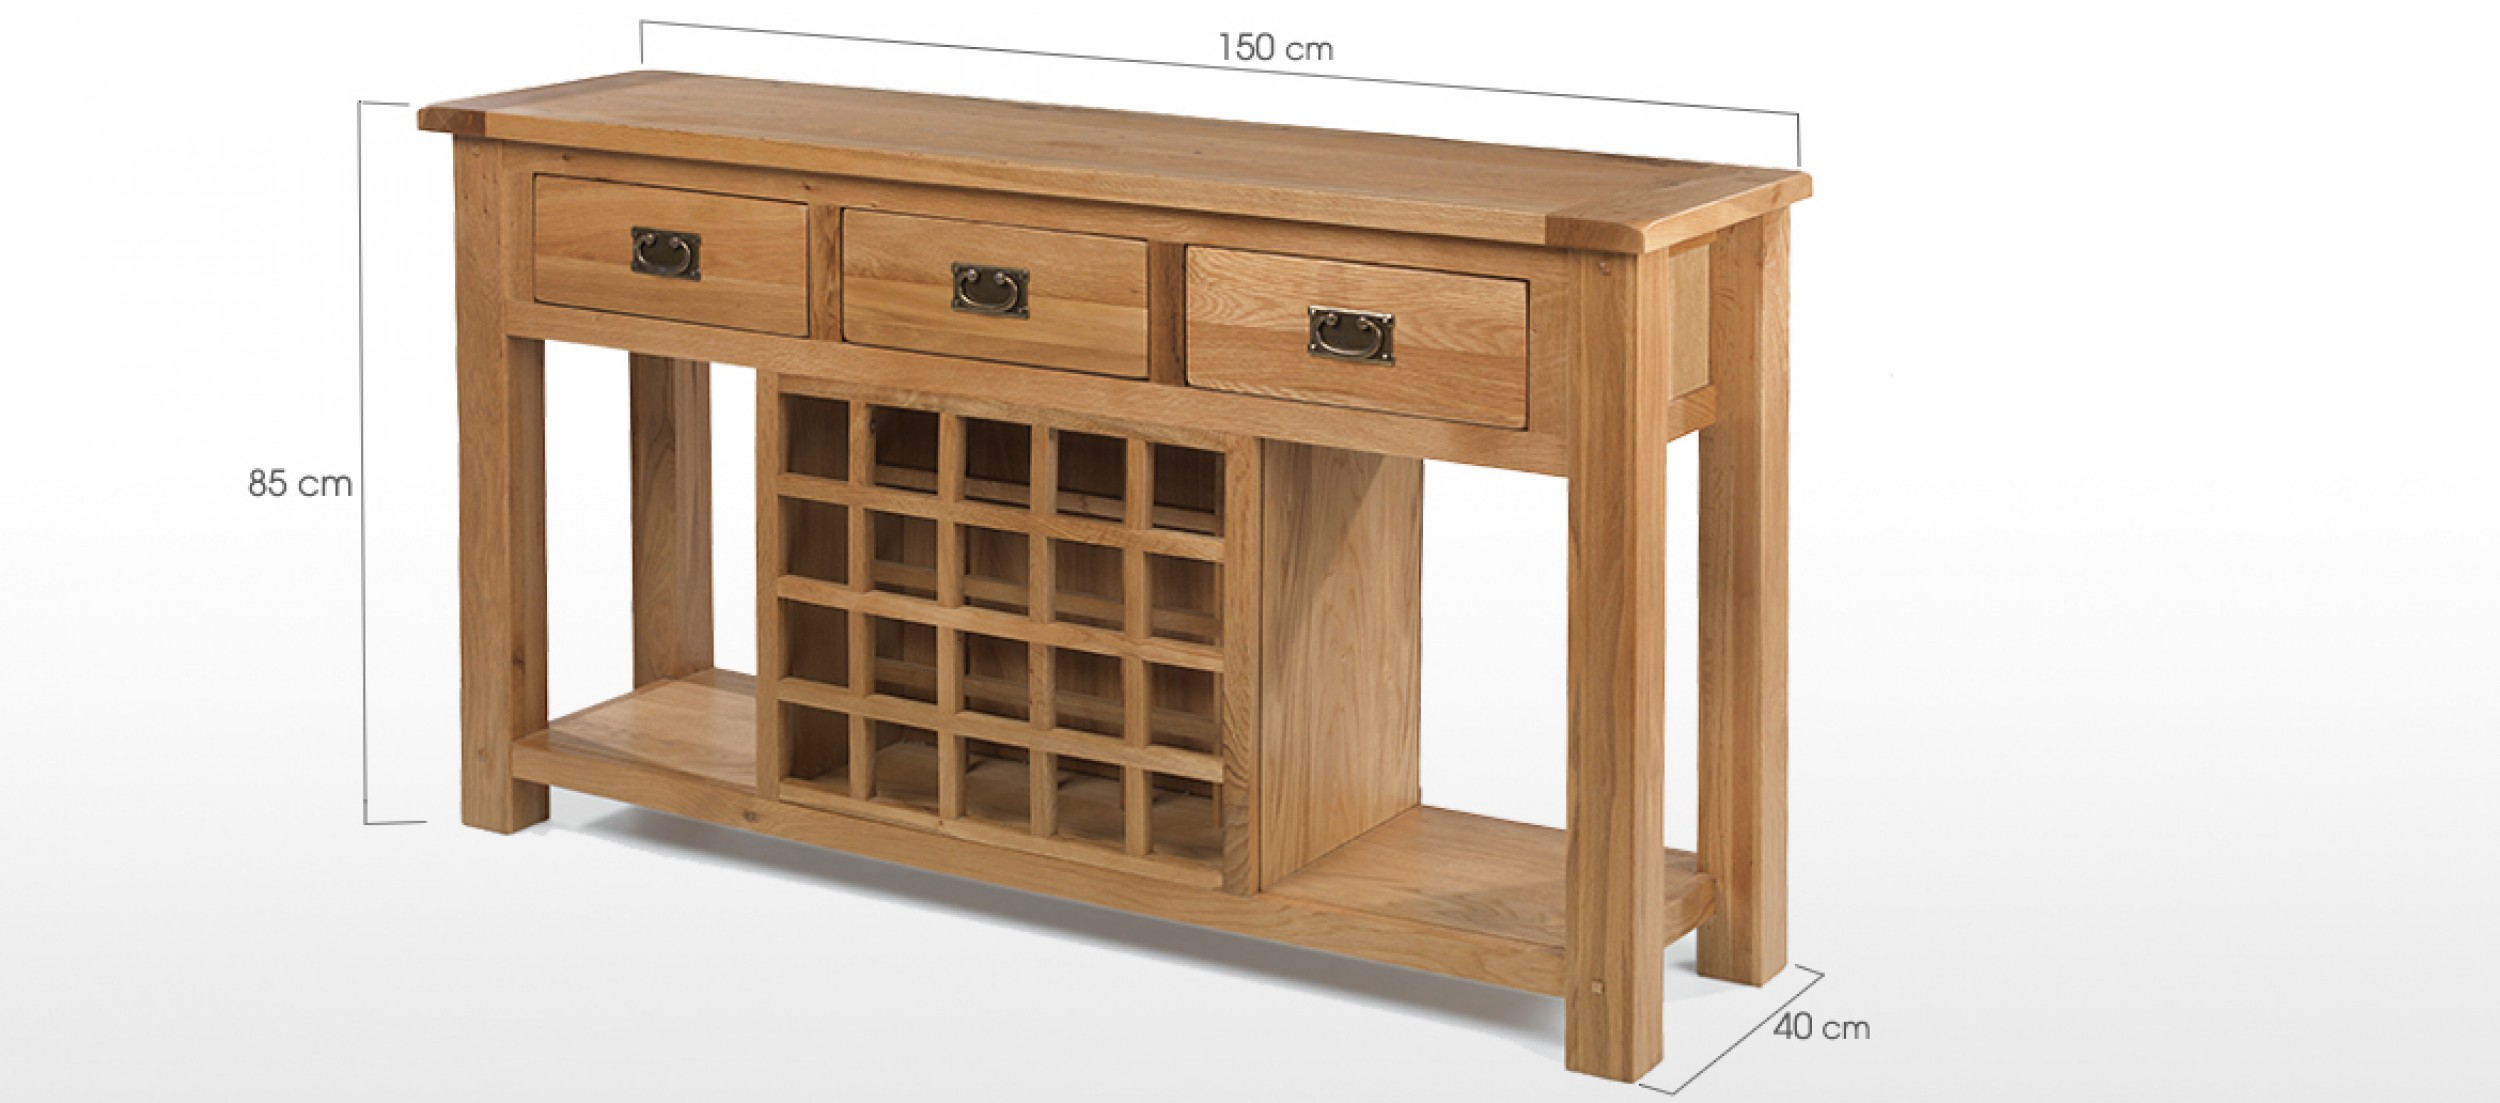 standard sofa table length cama barato barcelona rustic oak wine rack console quercus living